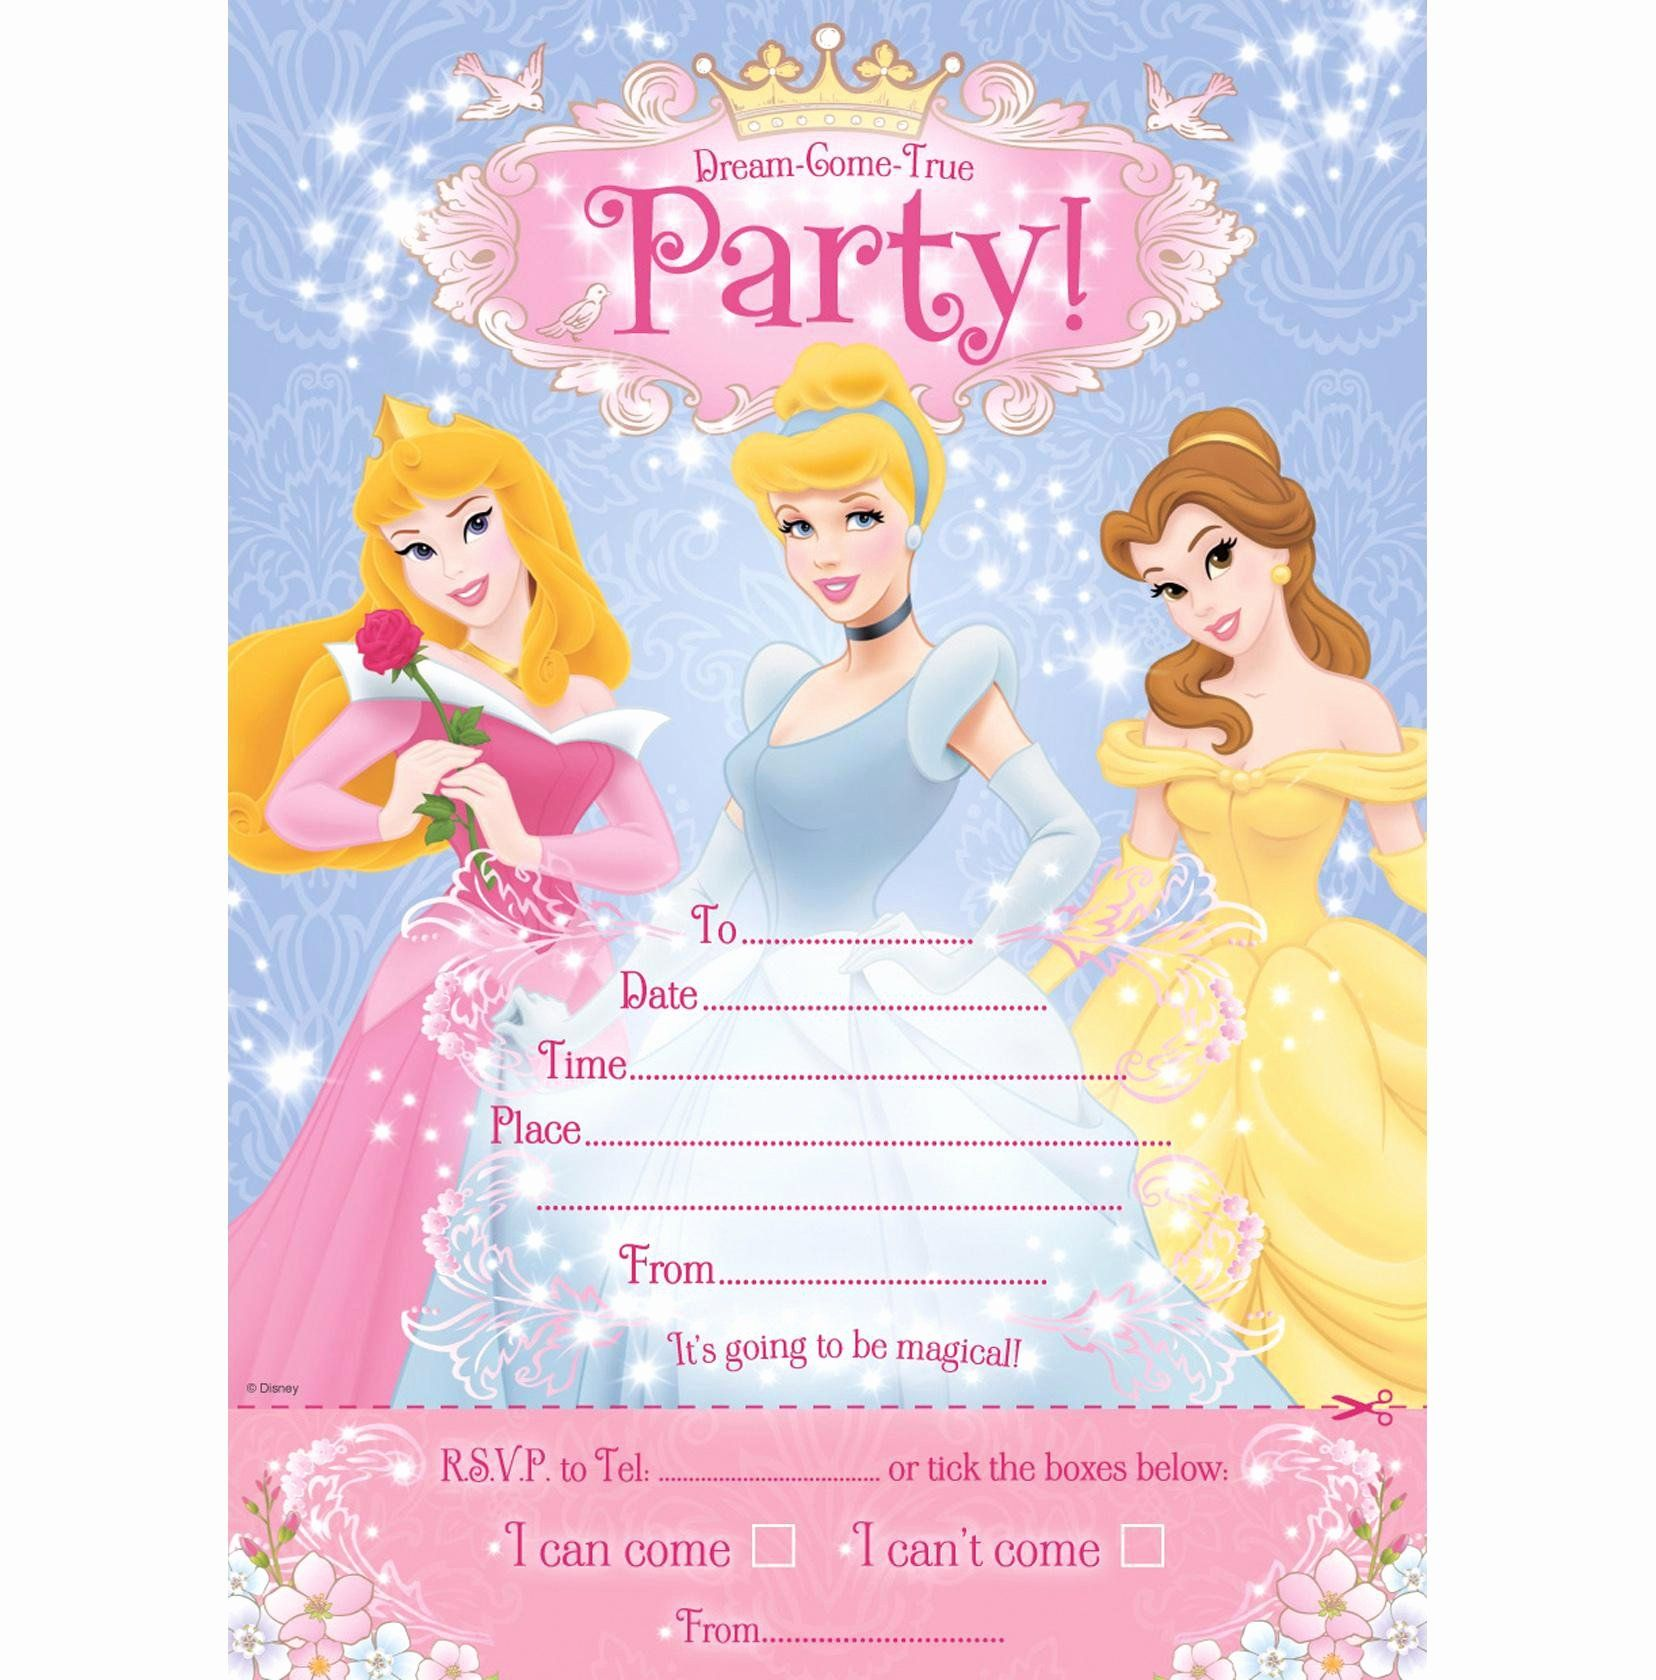 Disney Princess Invitation Template New 30th Birthday Invitations 30th Birthday Inv Disney Princess Invitations Princess Party Invitations Princess Invitations